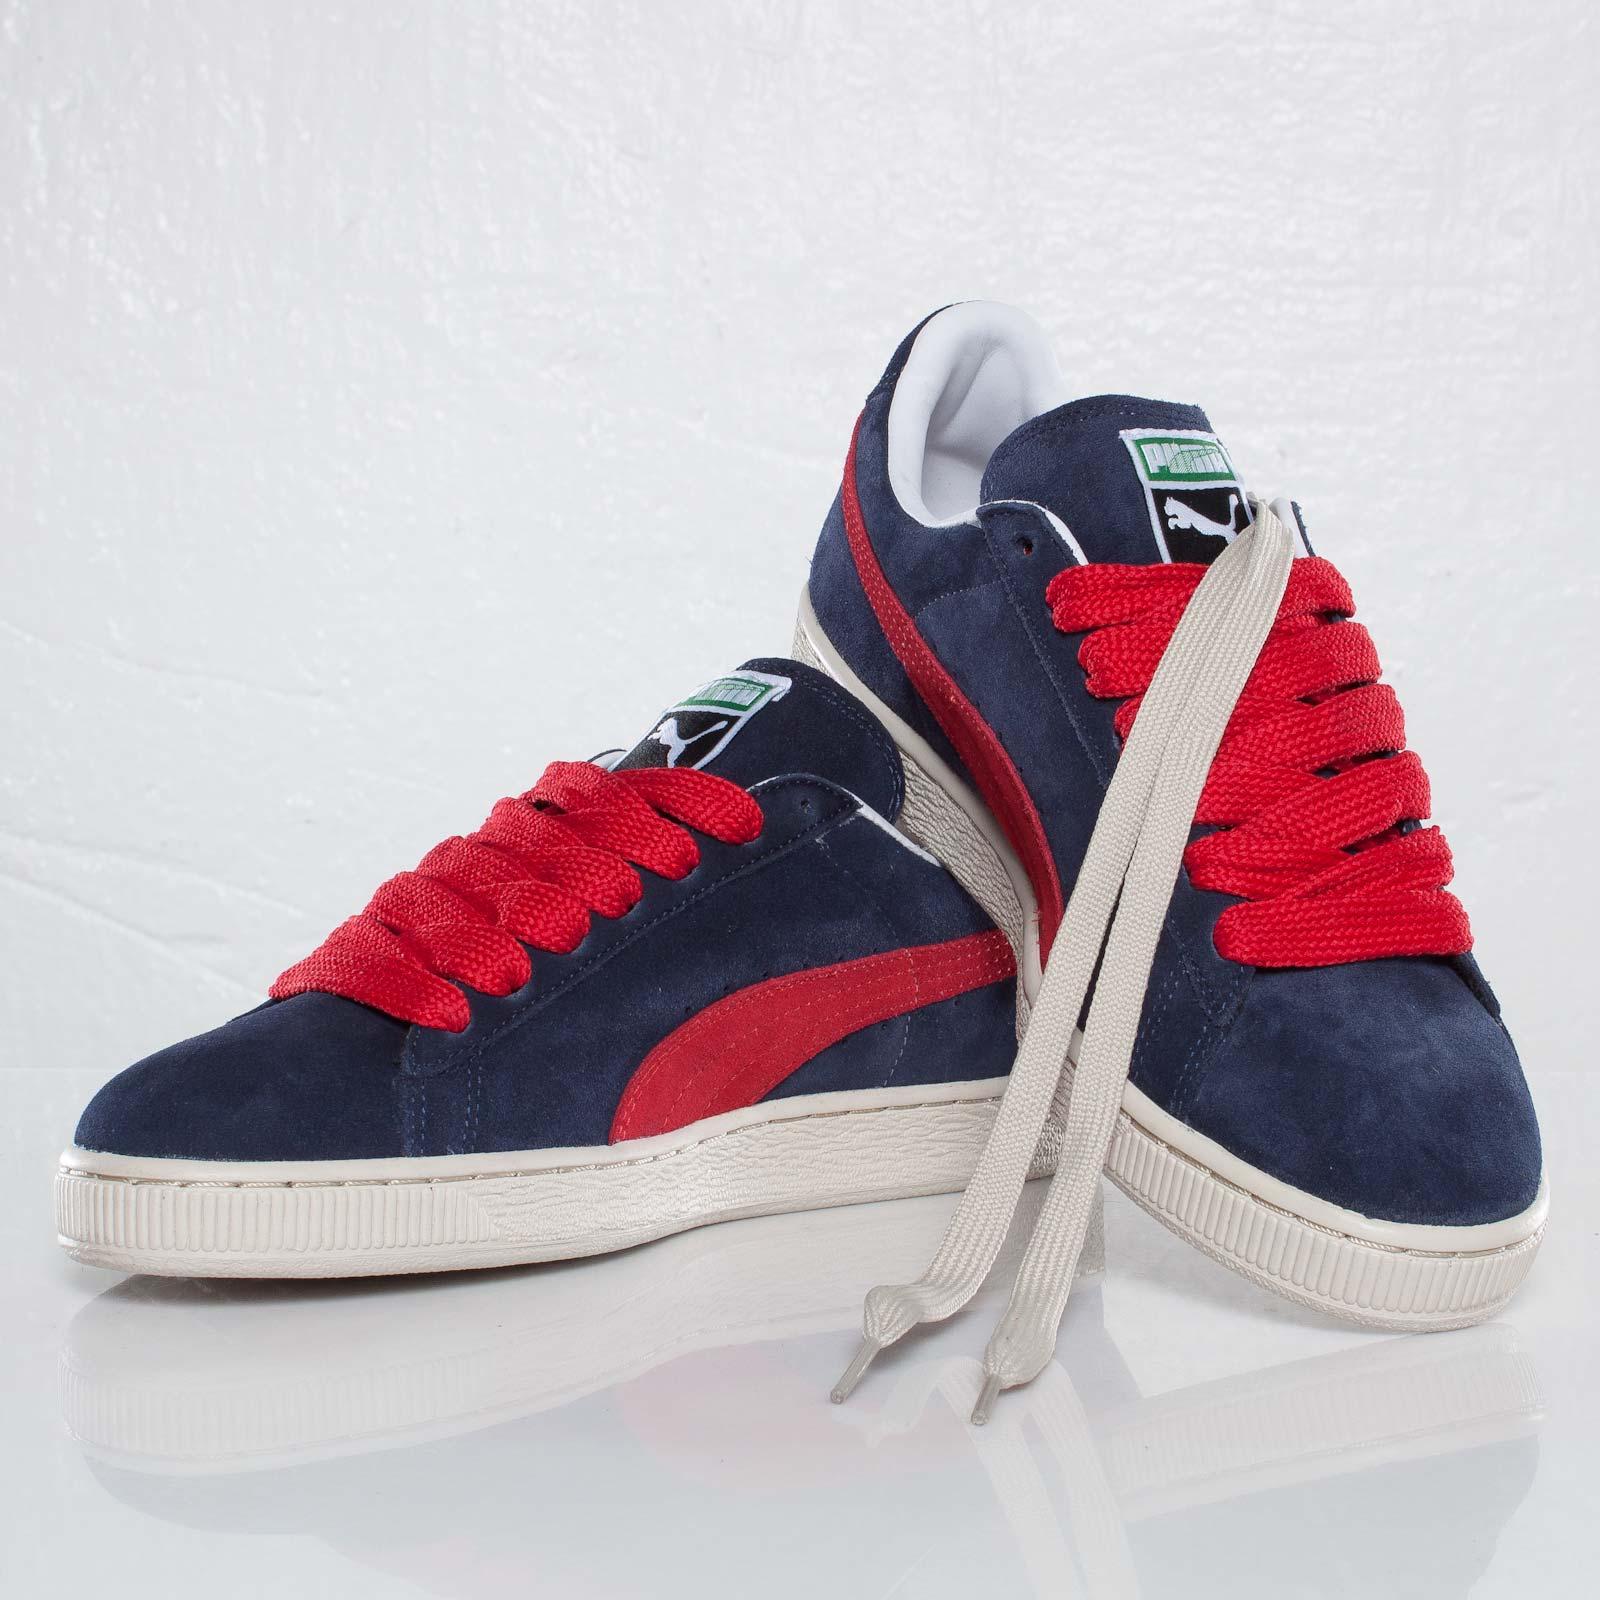 a52fb82bb54 Puma Suede Classic ECO - 111204 - Sneakersnstuff